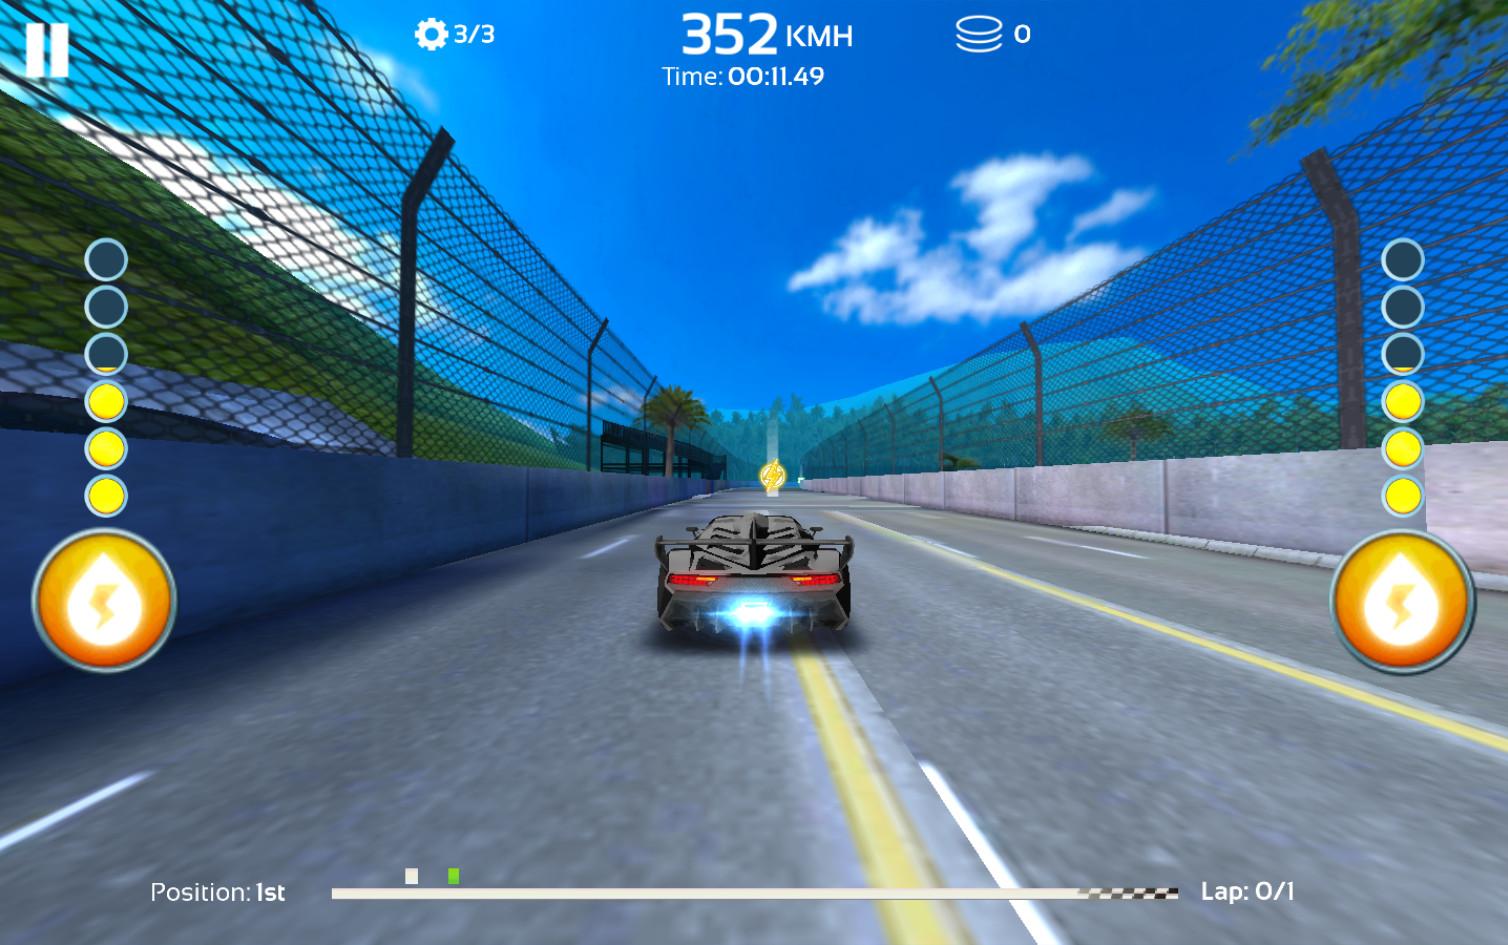 Giochi completi per Android gratuiti - Racing 3D: Extreme Furious Driver in pista